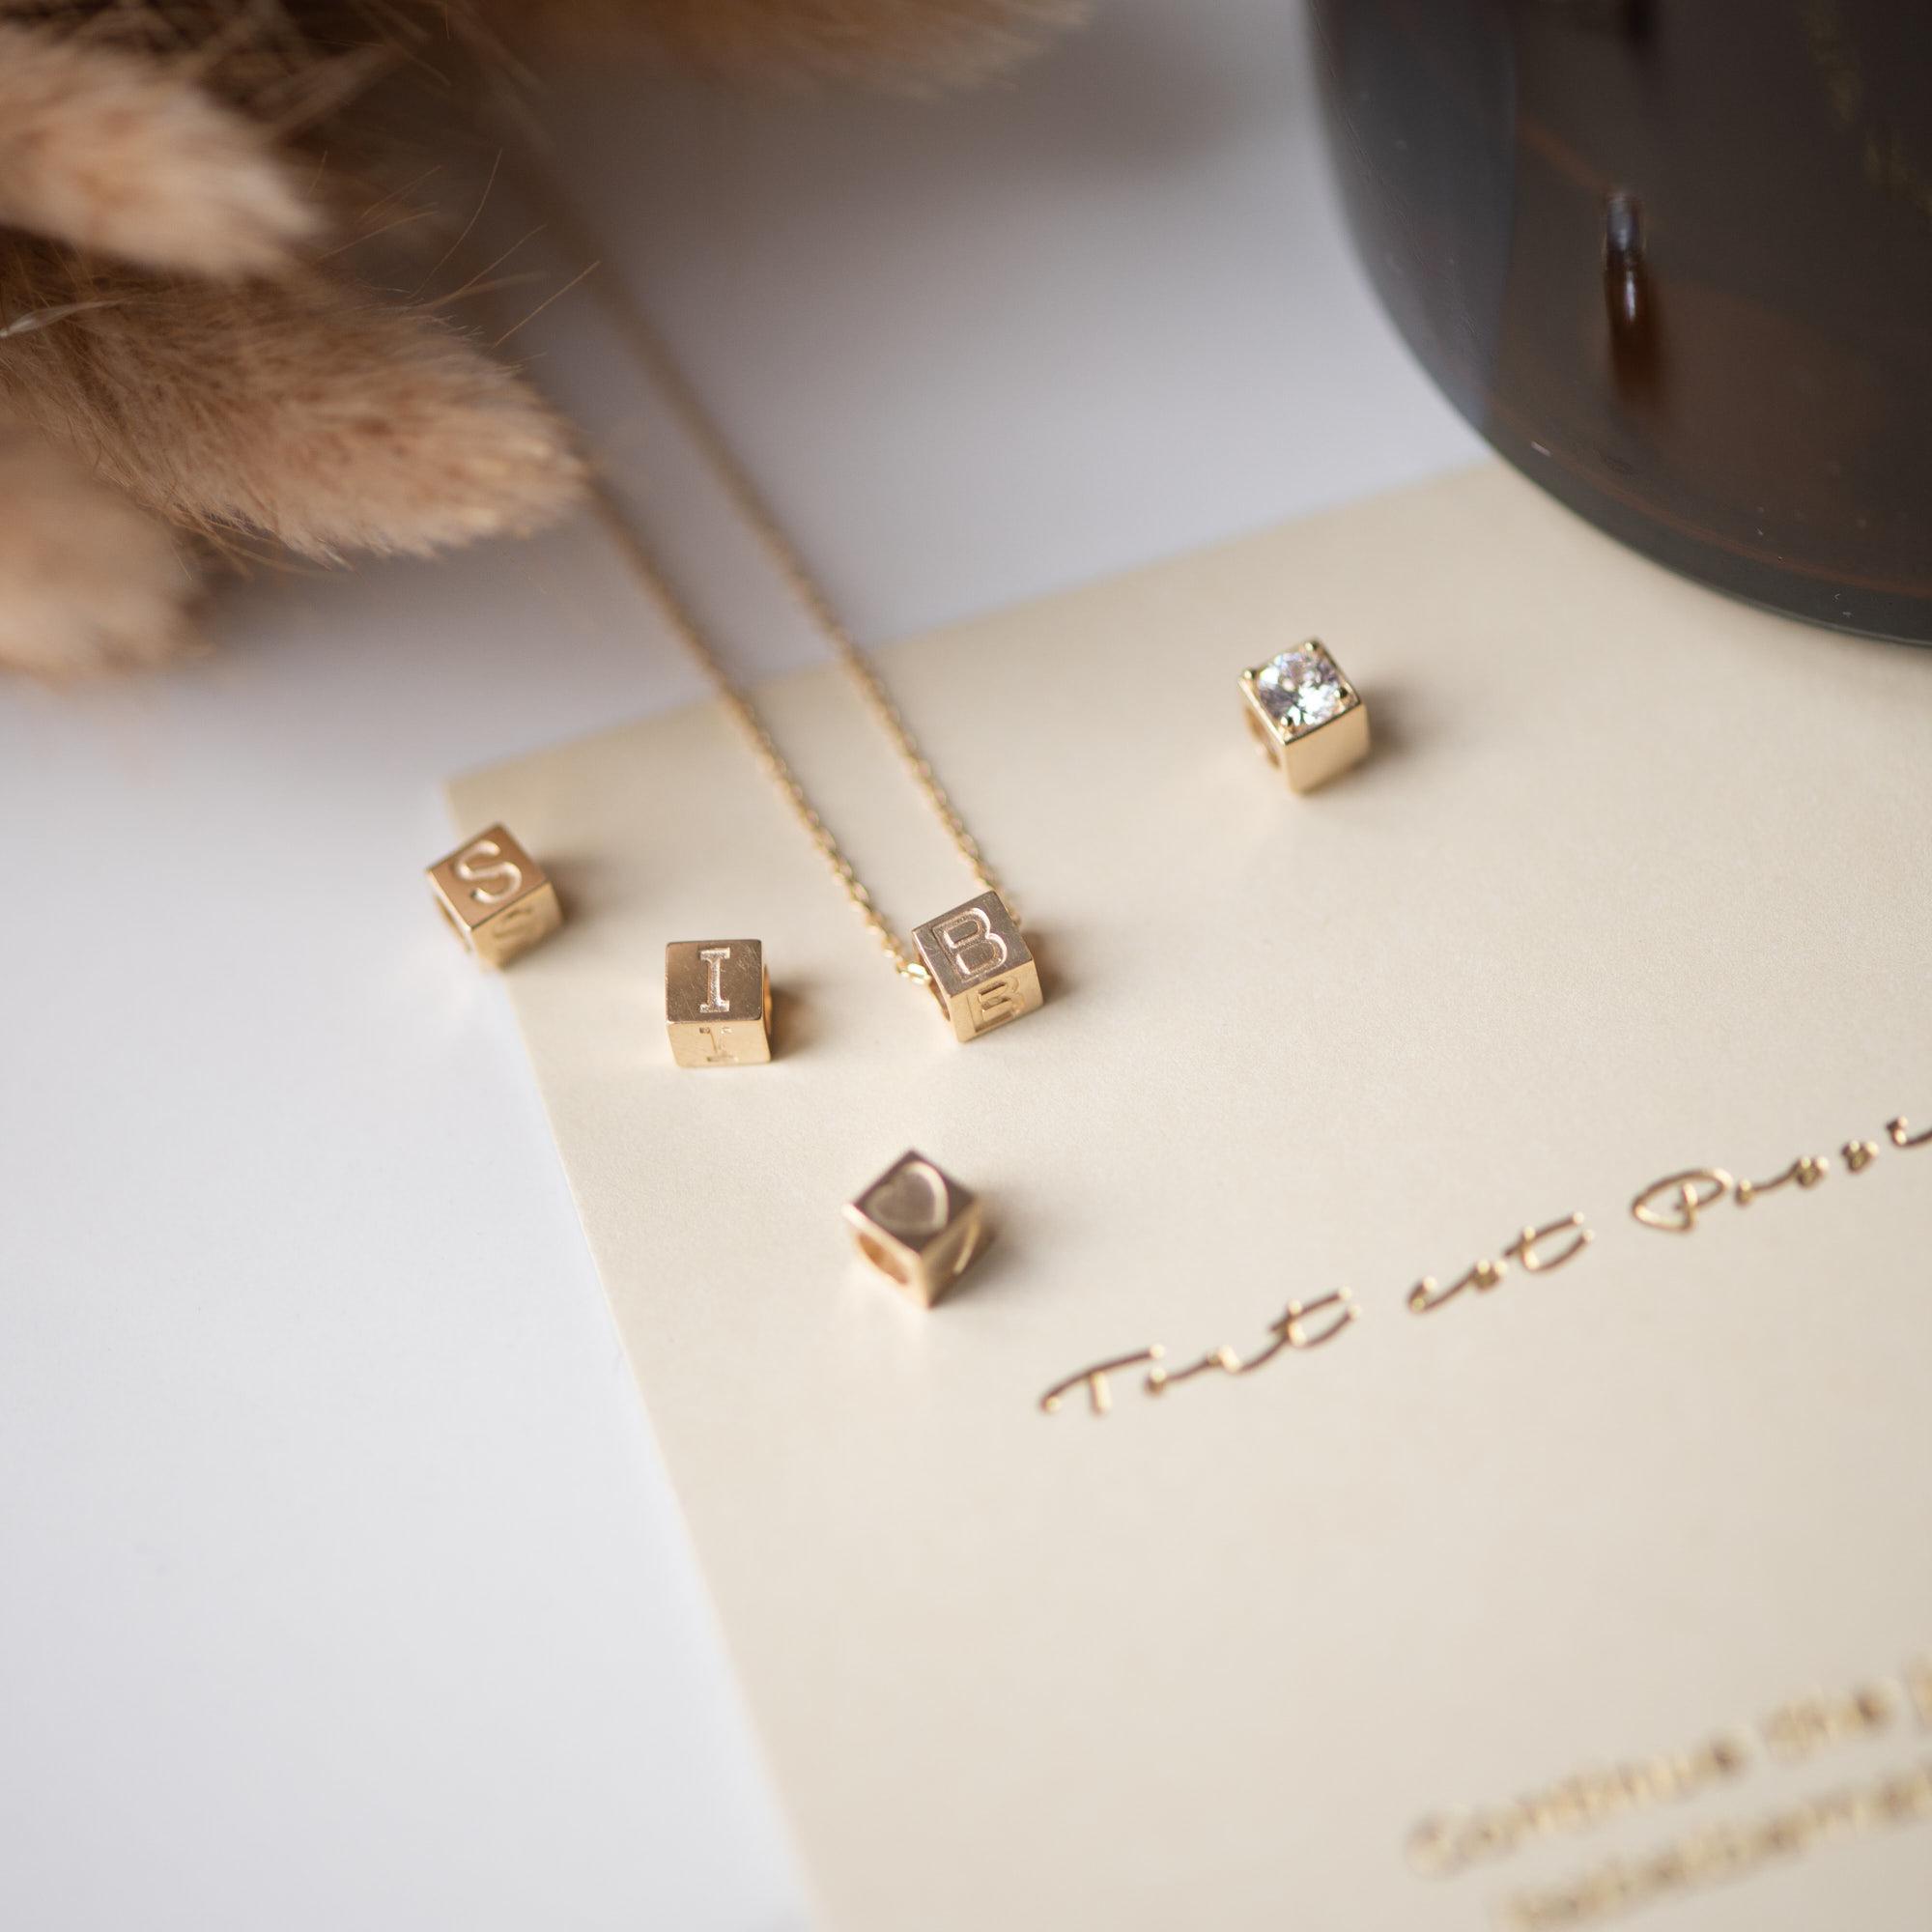 Isabel Bernard Le Carré Felie 585er Goldwürfel Charm mit Herz